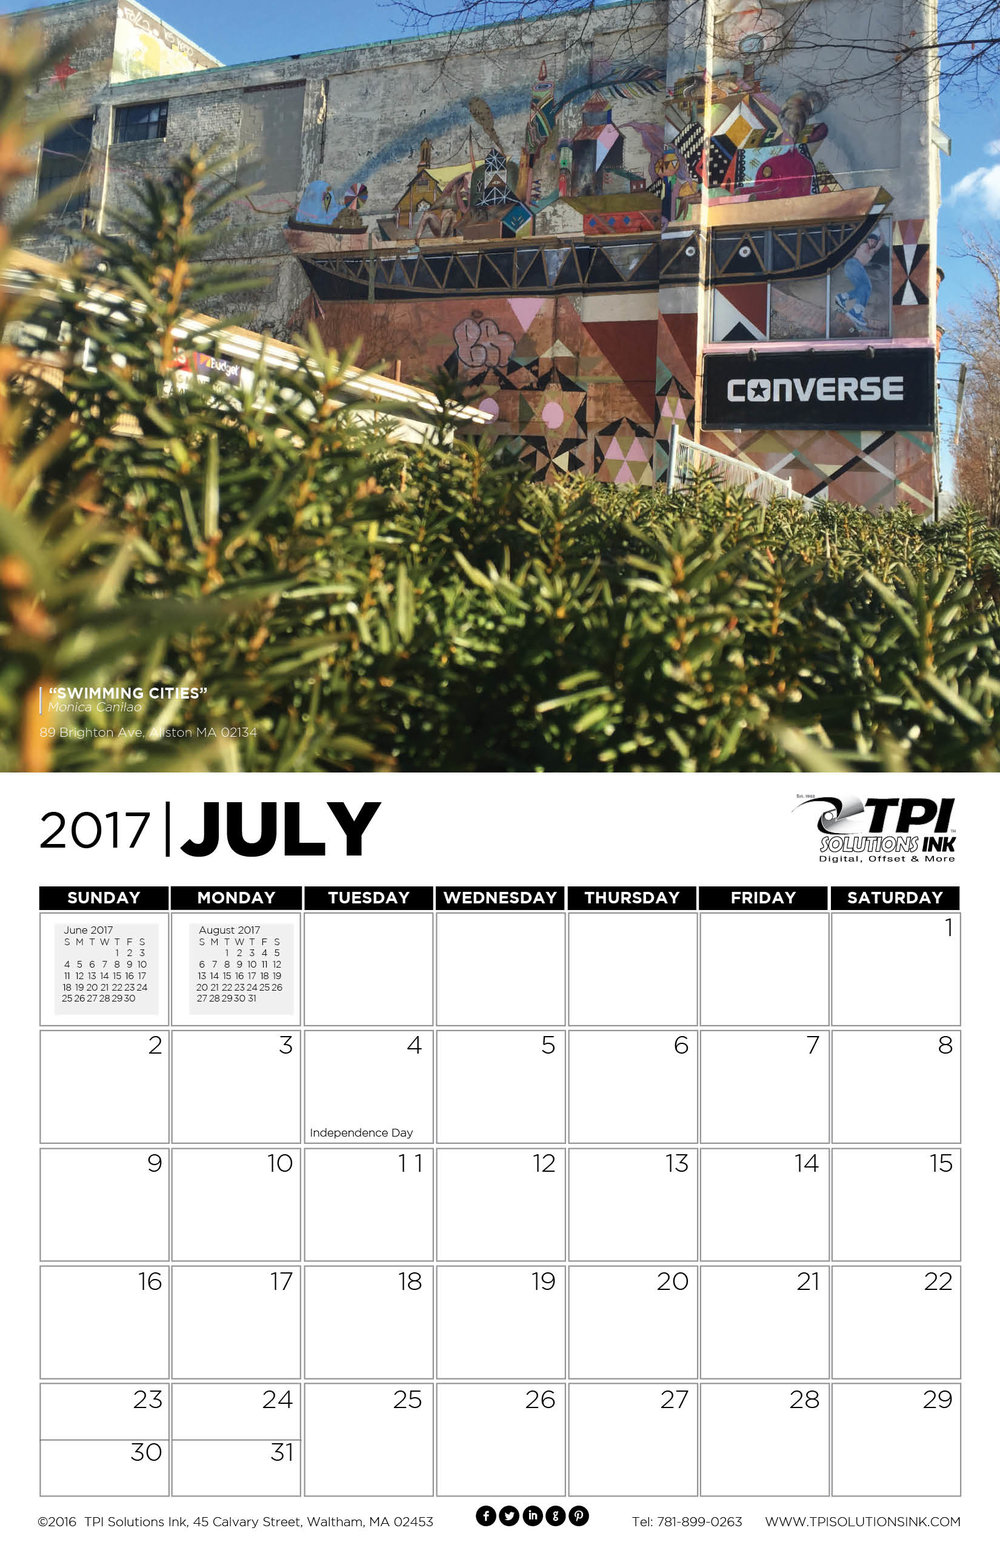 2017_JULY.jpg